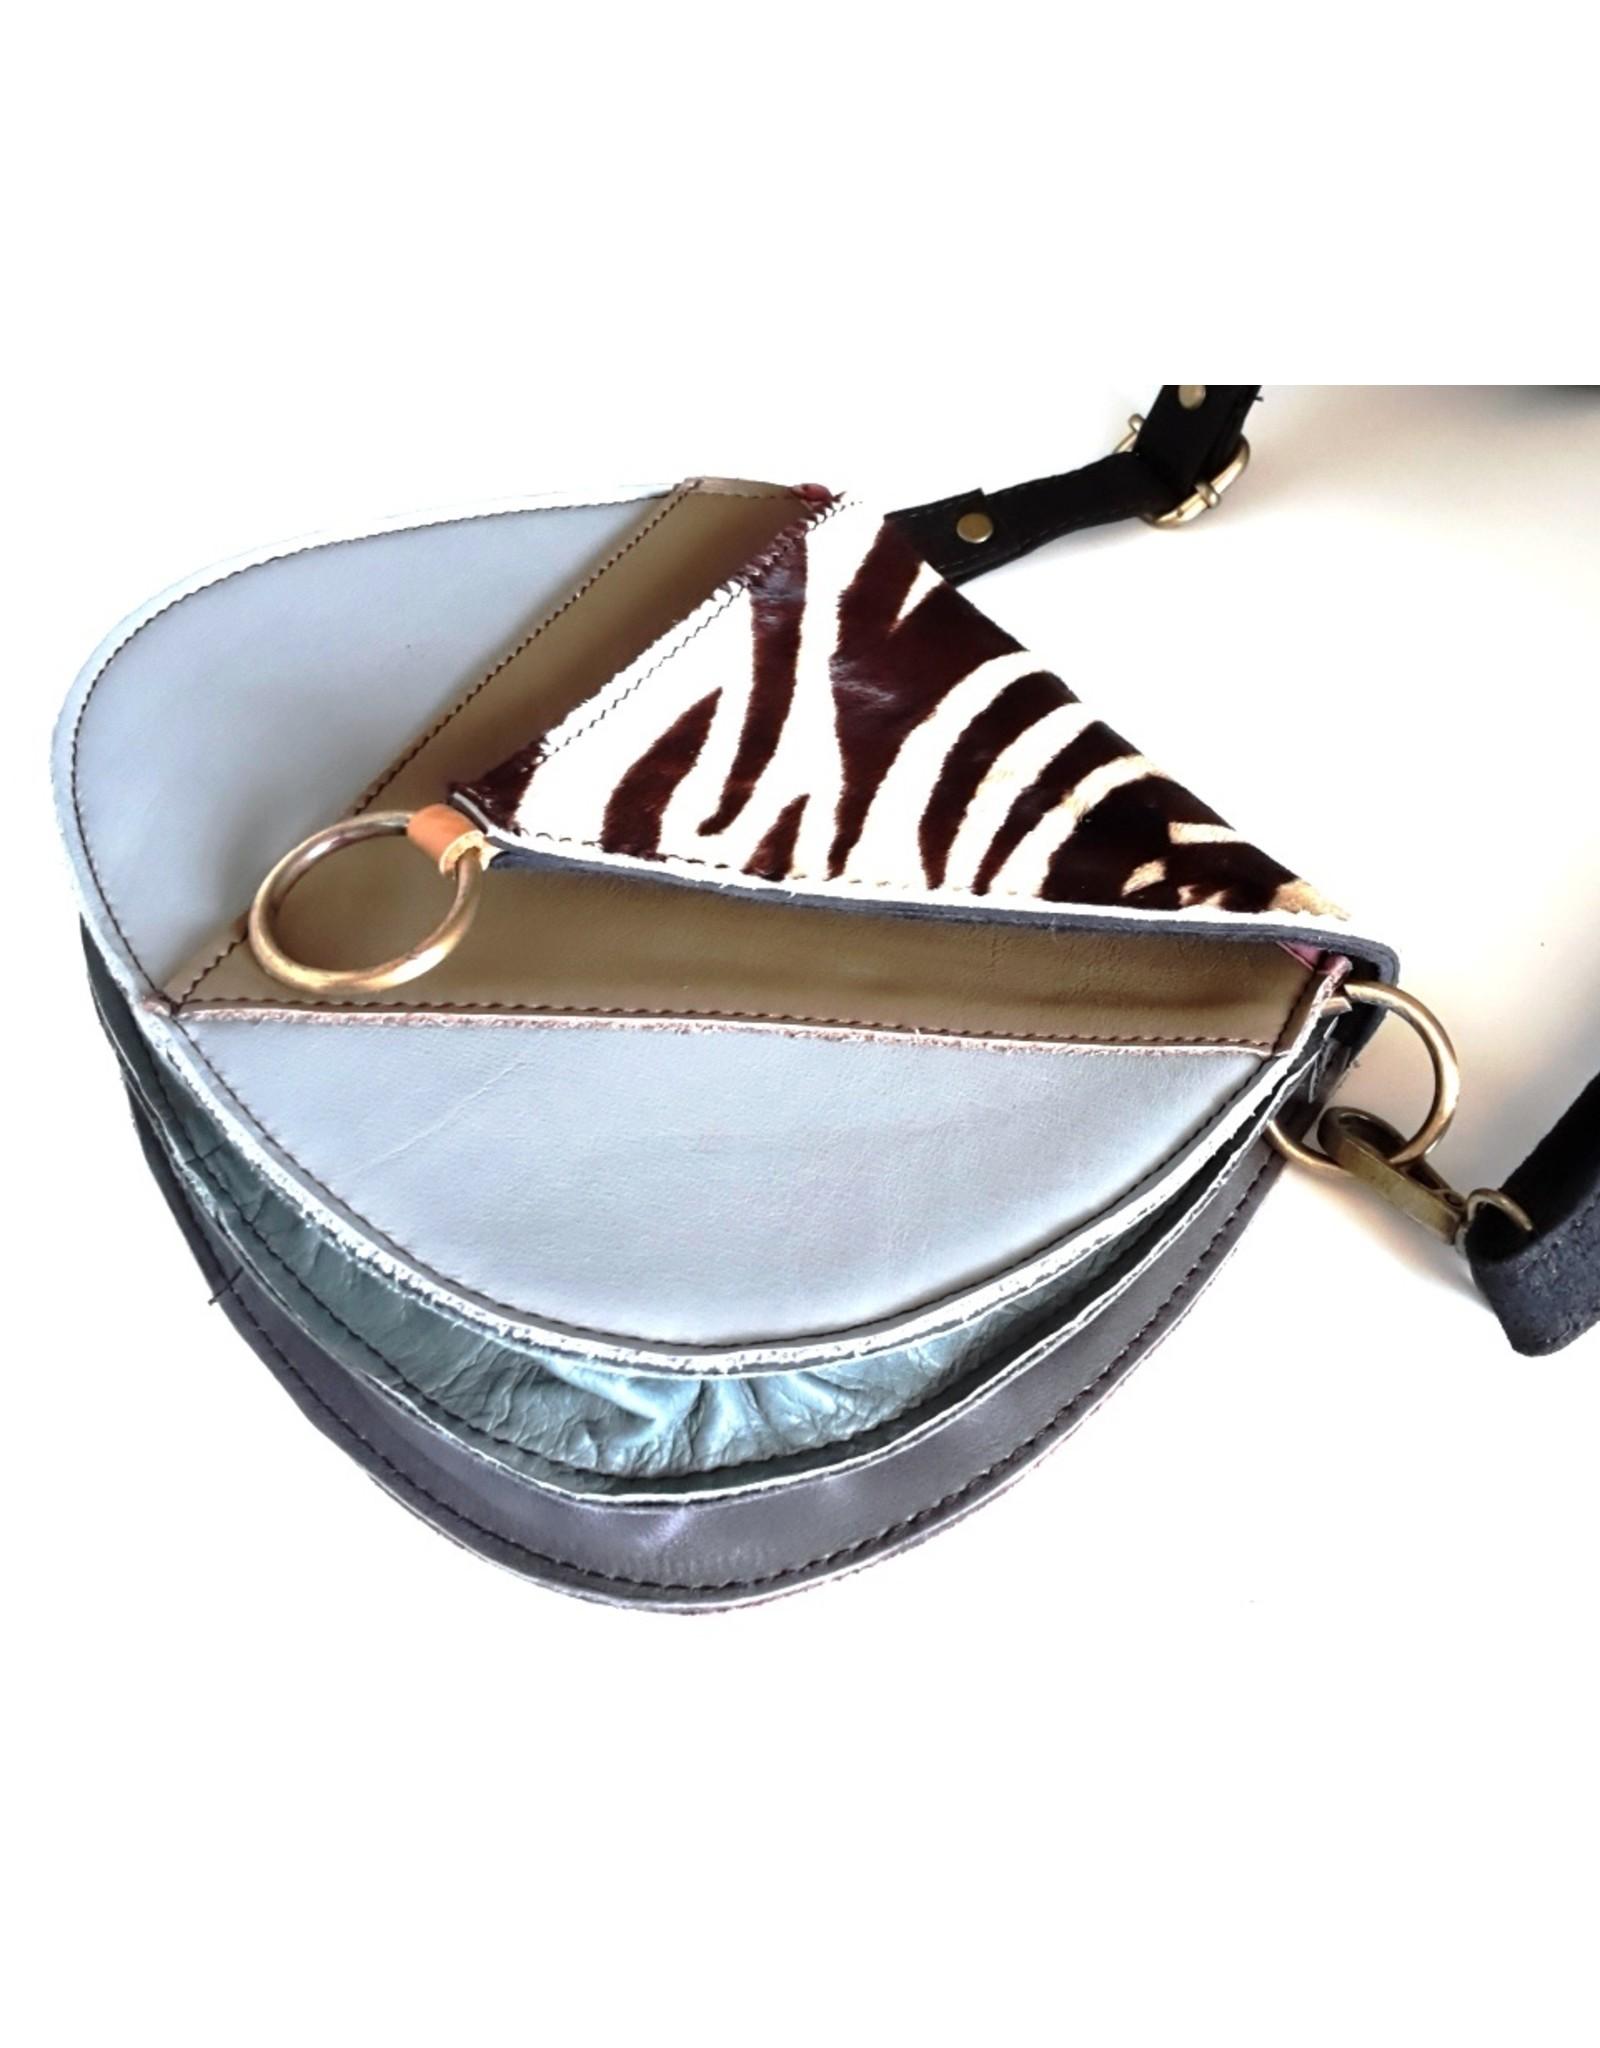 Trukado Leather Shoulder bags - Leather shoulder bag with zebra print cover